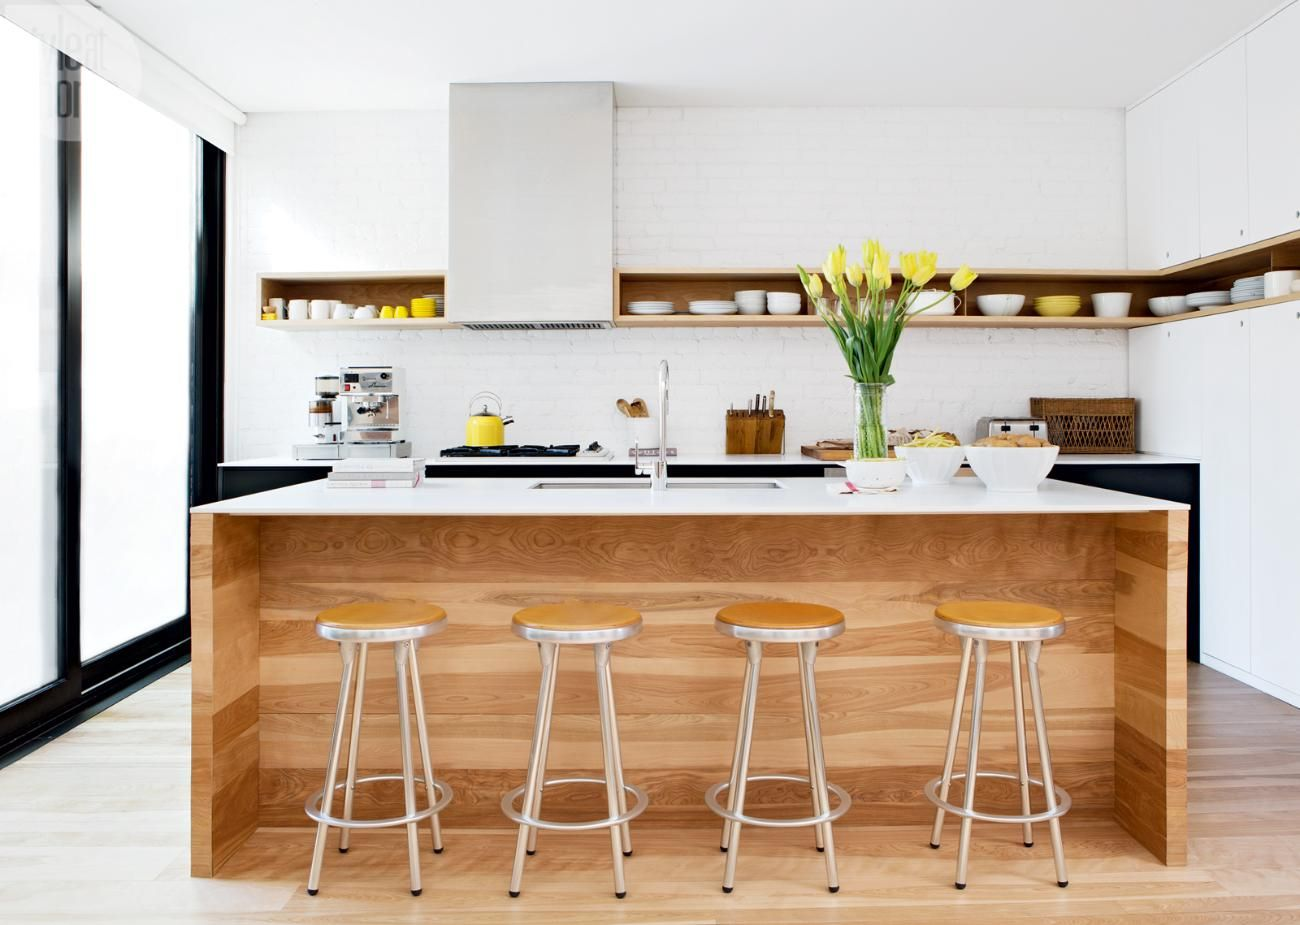 Kitchen open concept kitchen concept kitchens and open concept